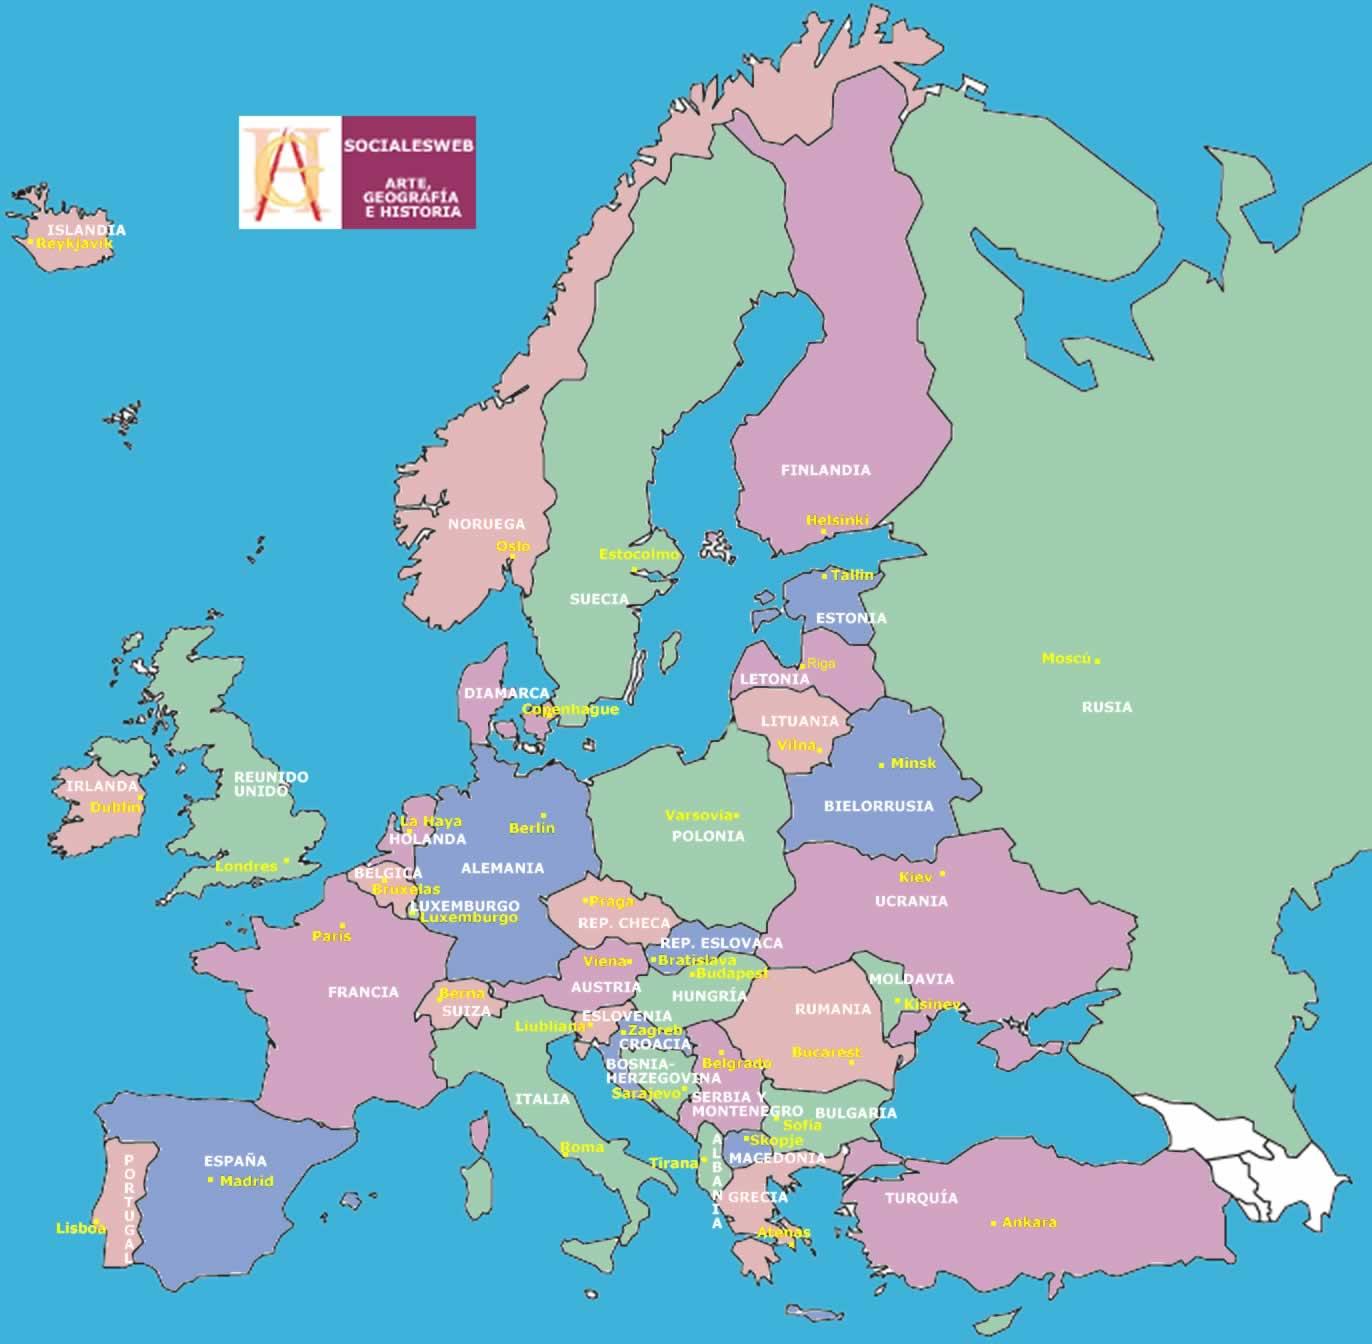 la situacion en europa: